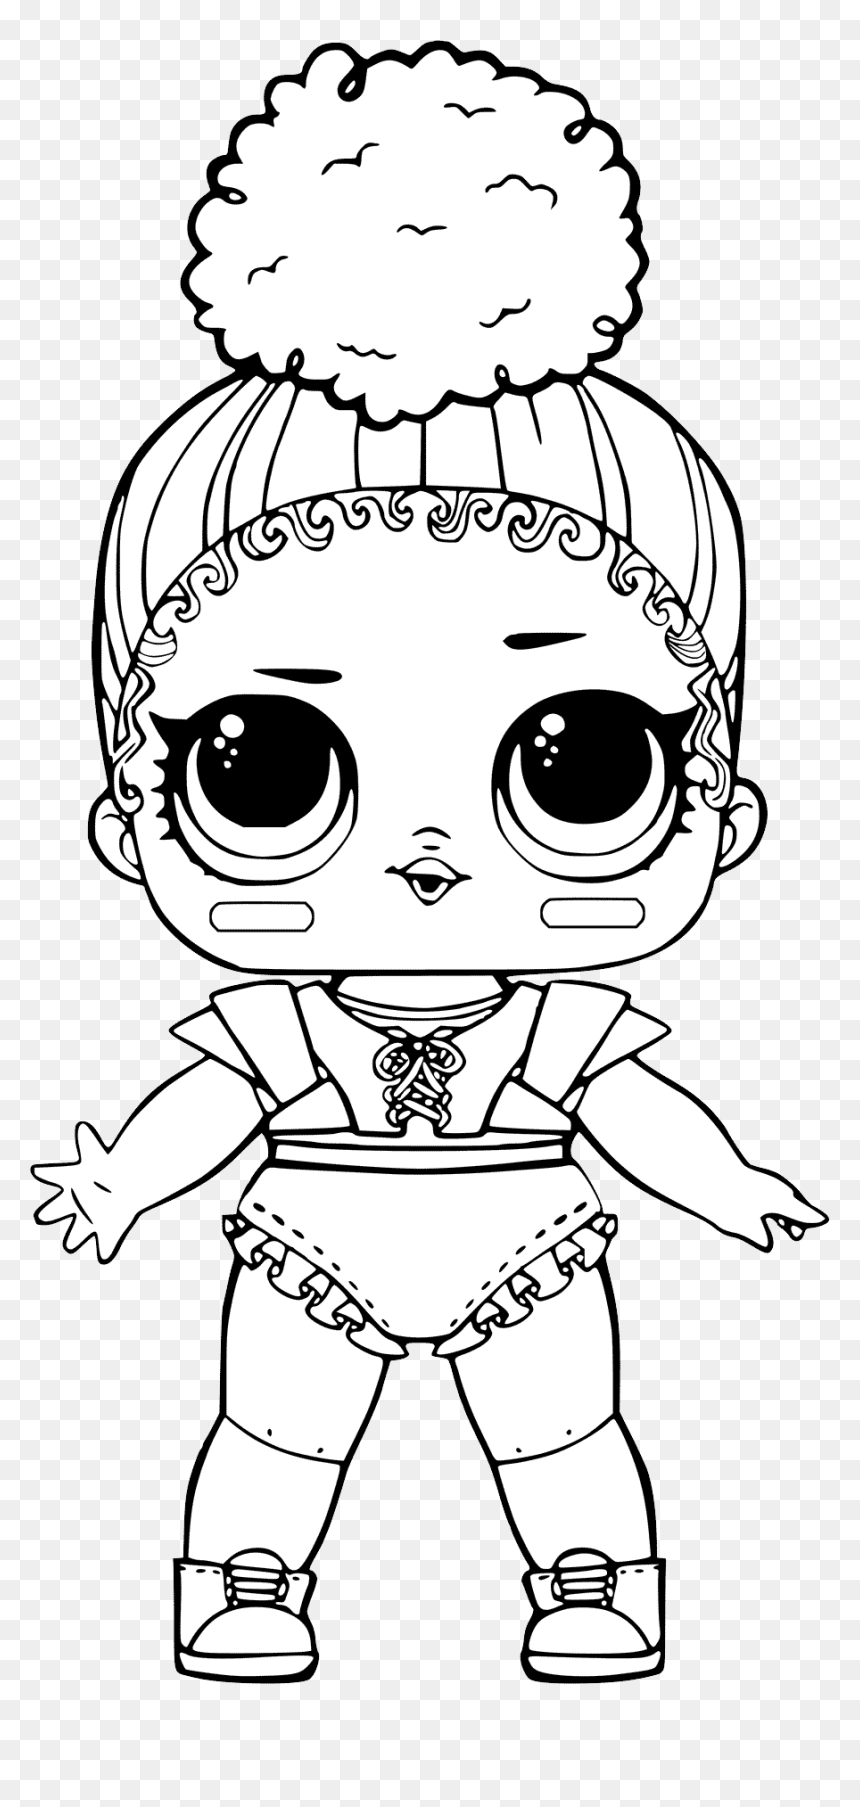 L - O - L - Surprise Doll Png - Lol Doll Coloring Pages Touchdown,  Transparent Png - vhv